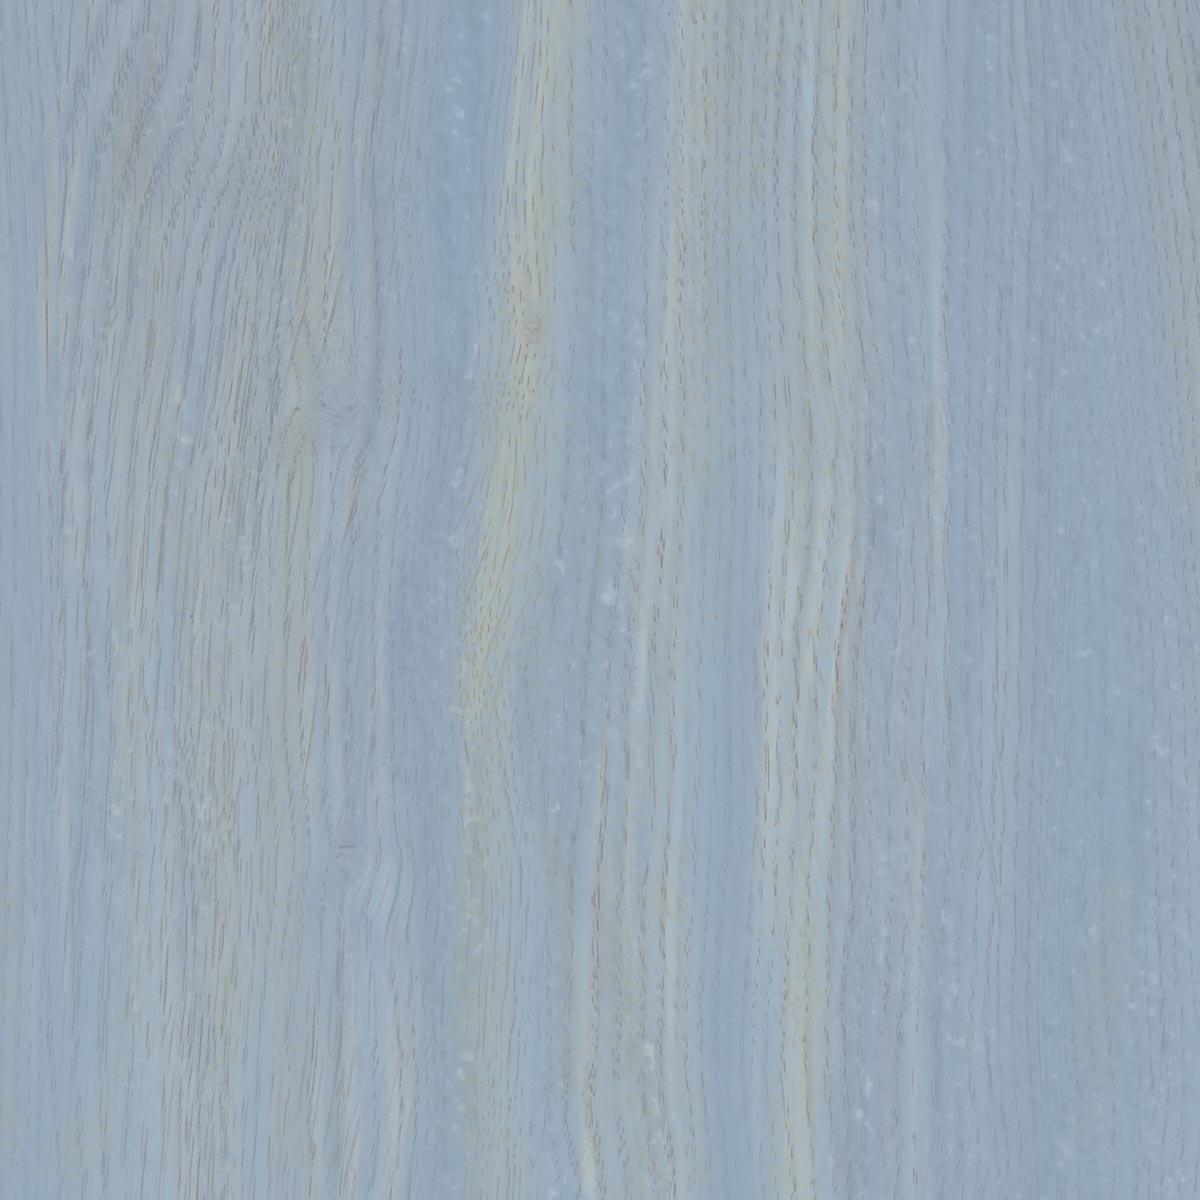 FolkArt ® Pickling Wash™ - Haze, 2 oz.